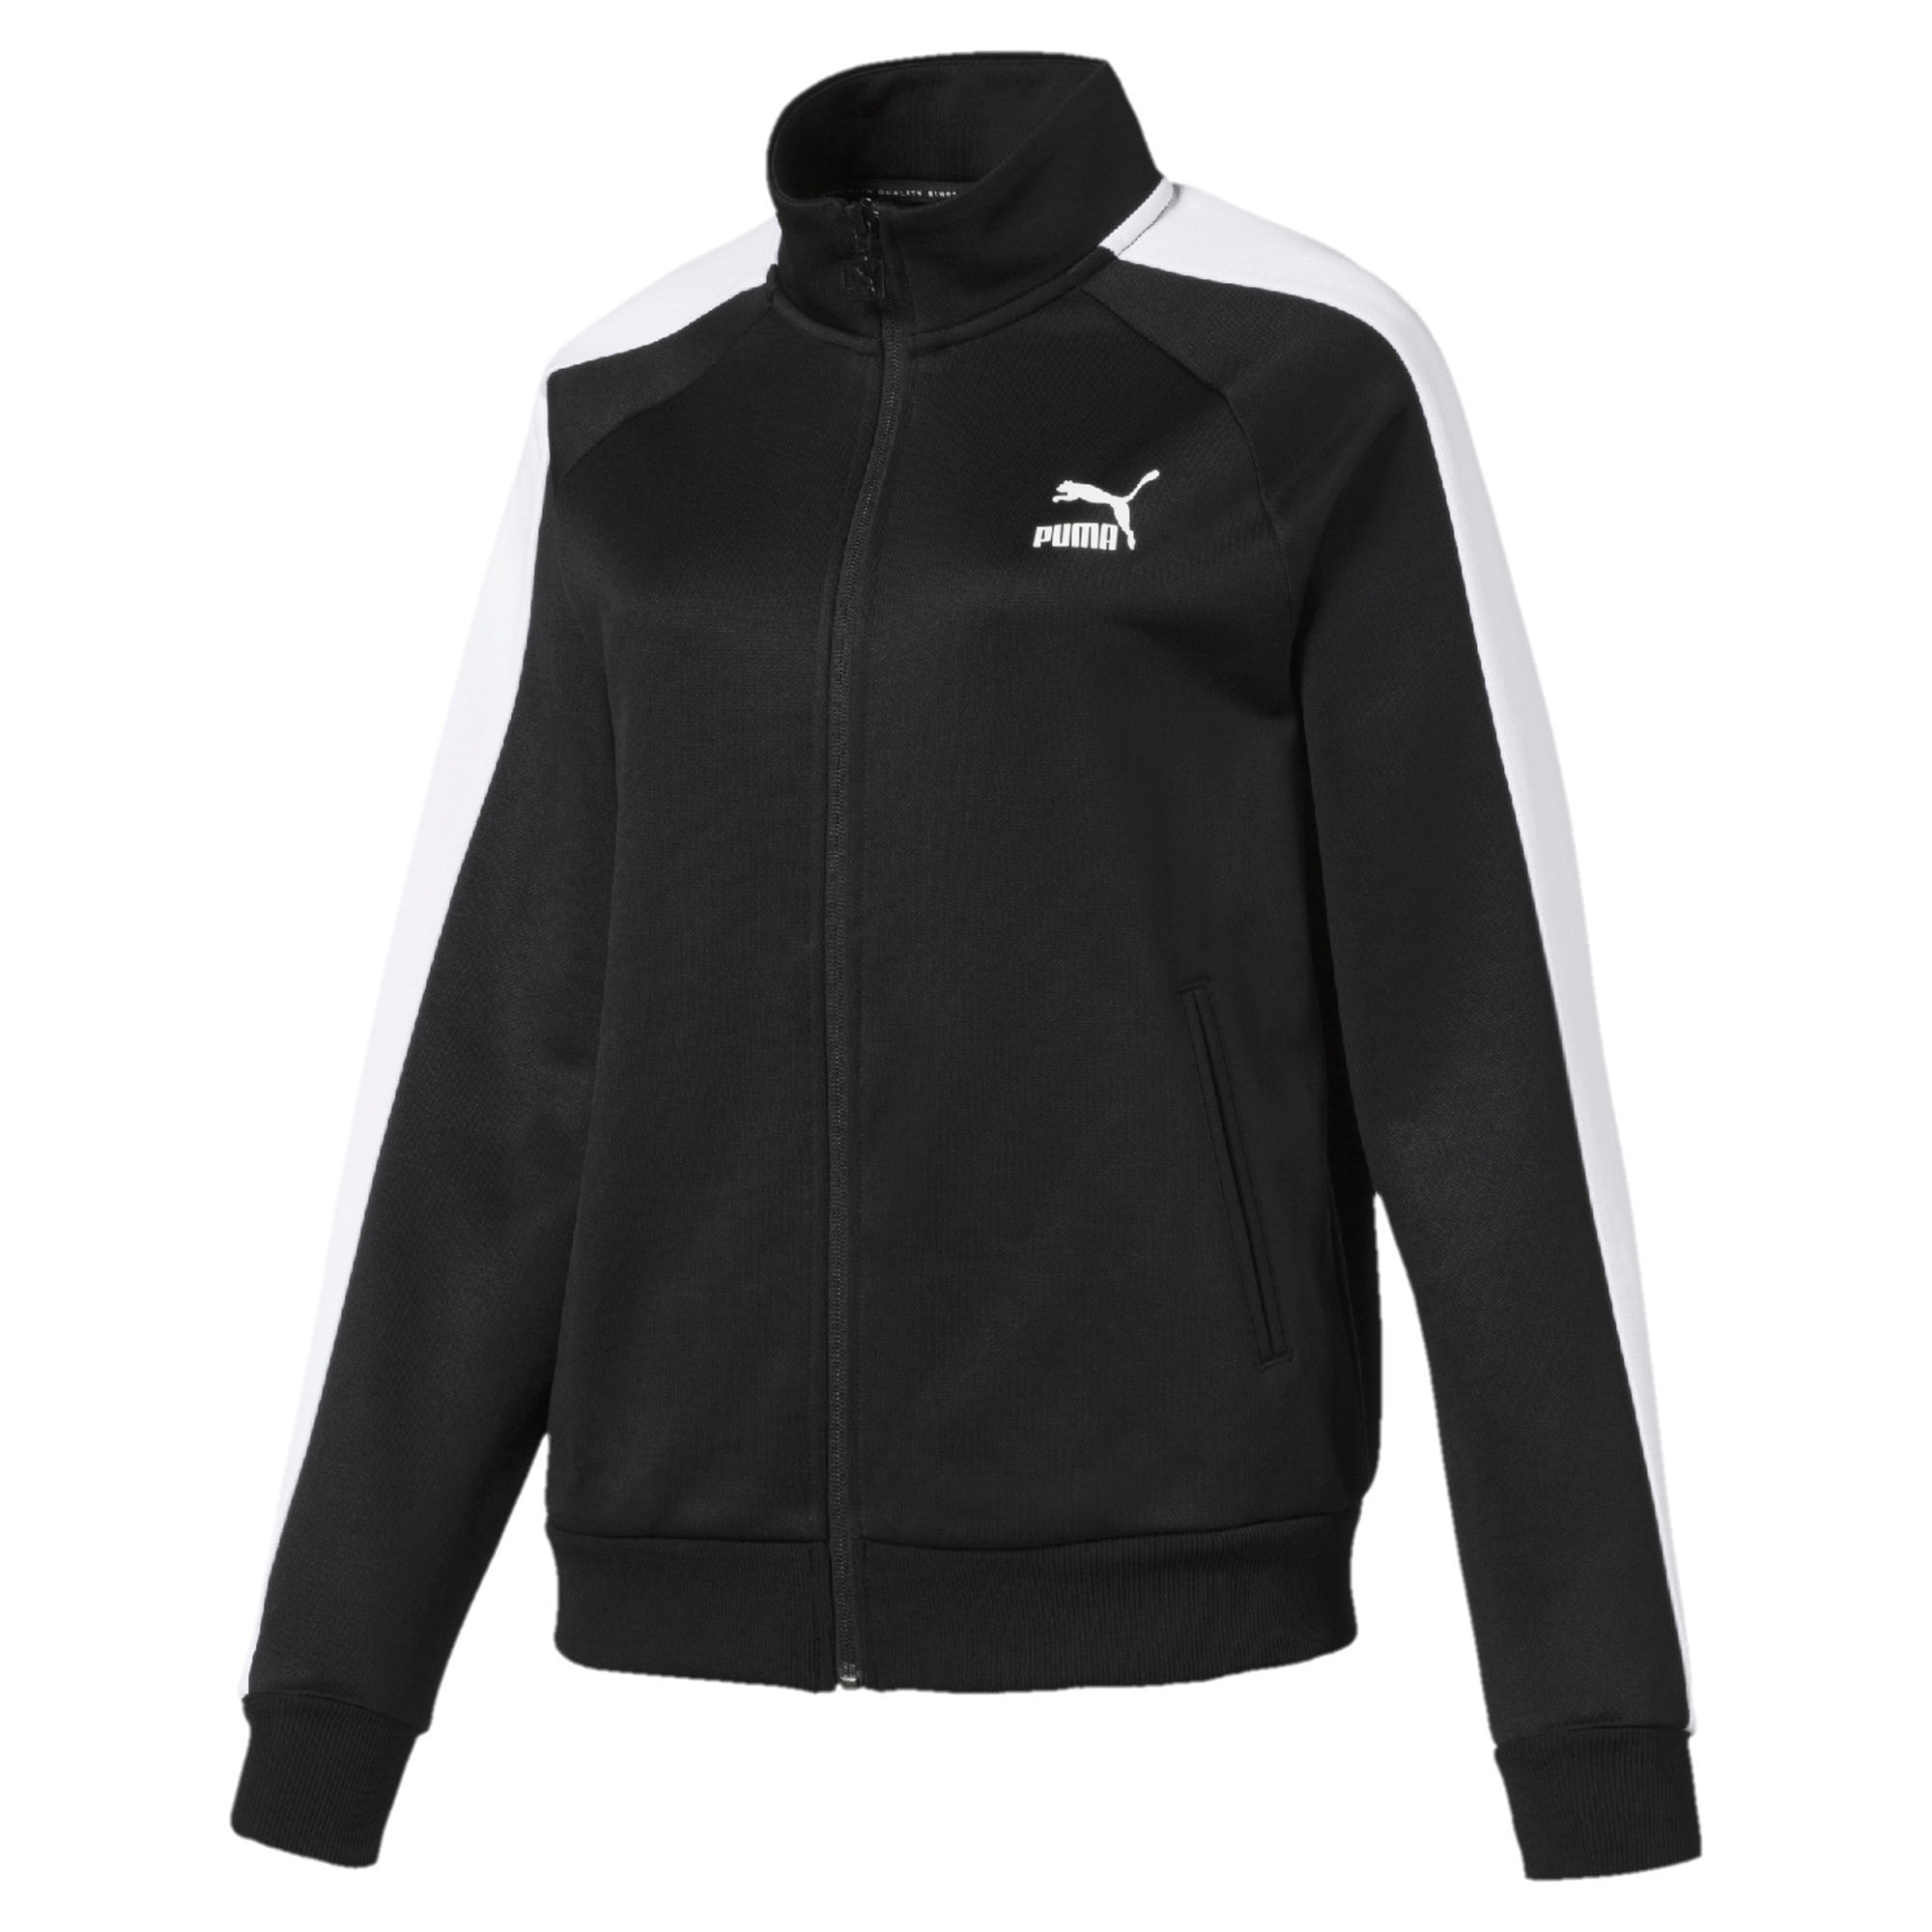 Thumbnail 4 of Classics T7 PT Women's Track Jacket, Puma Black-1, medium-IND